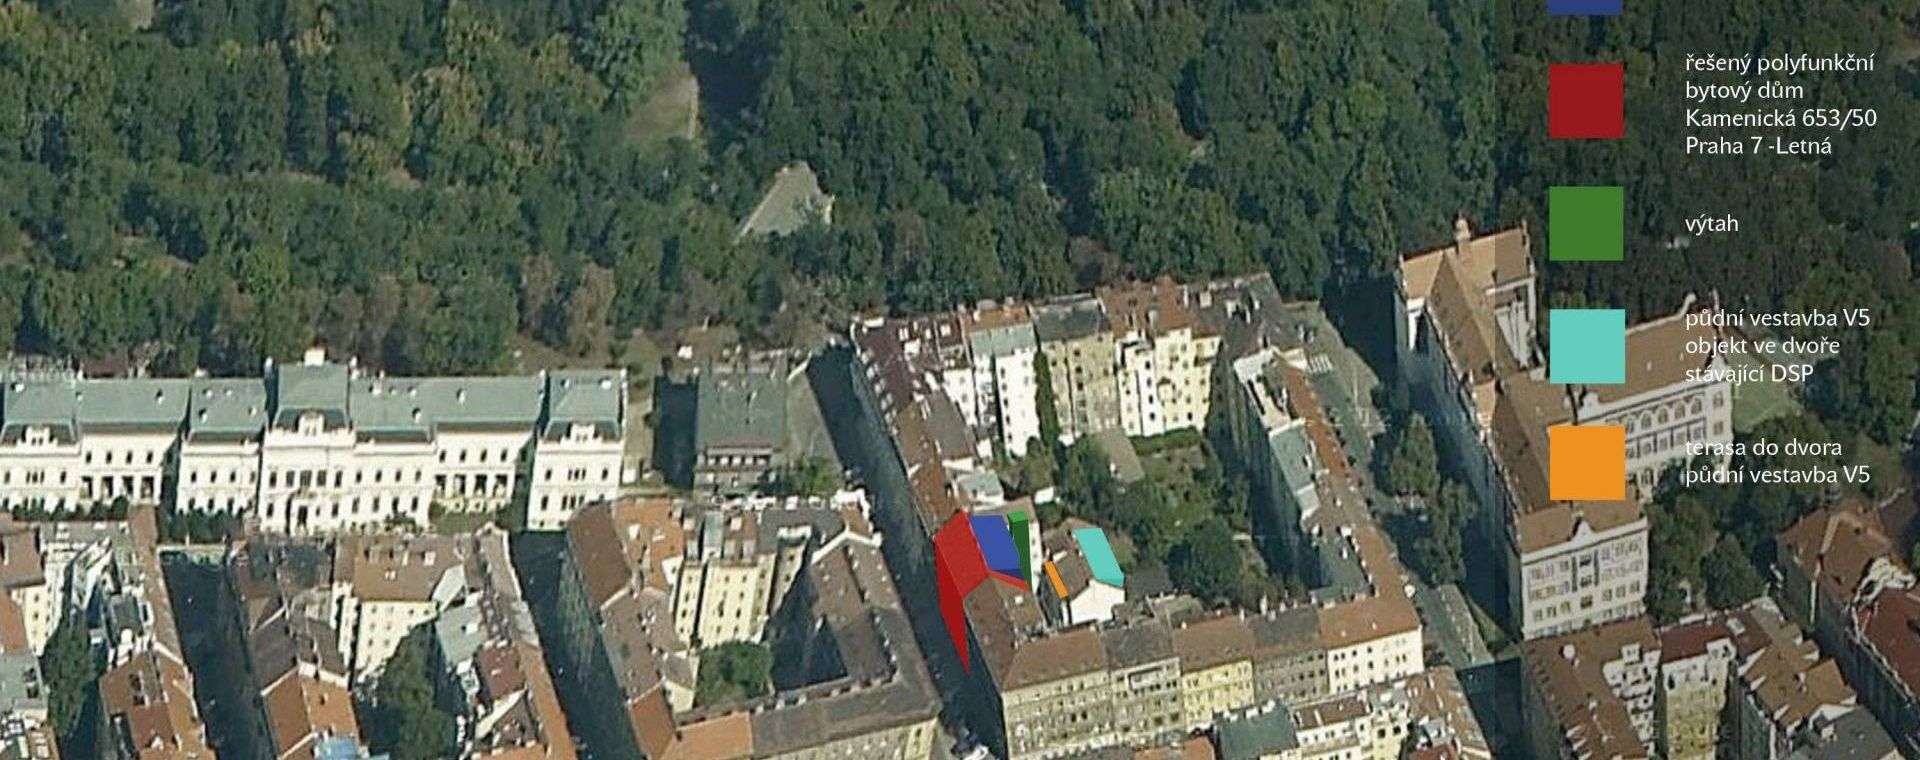 Apartment reconstruction - street Kamenická, Prague 7, 2012-2015, CZ